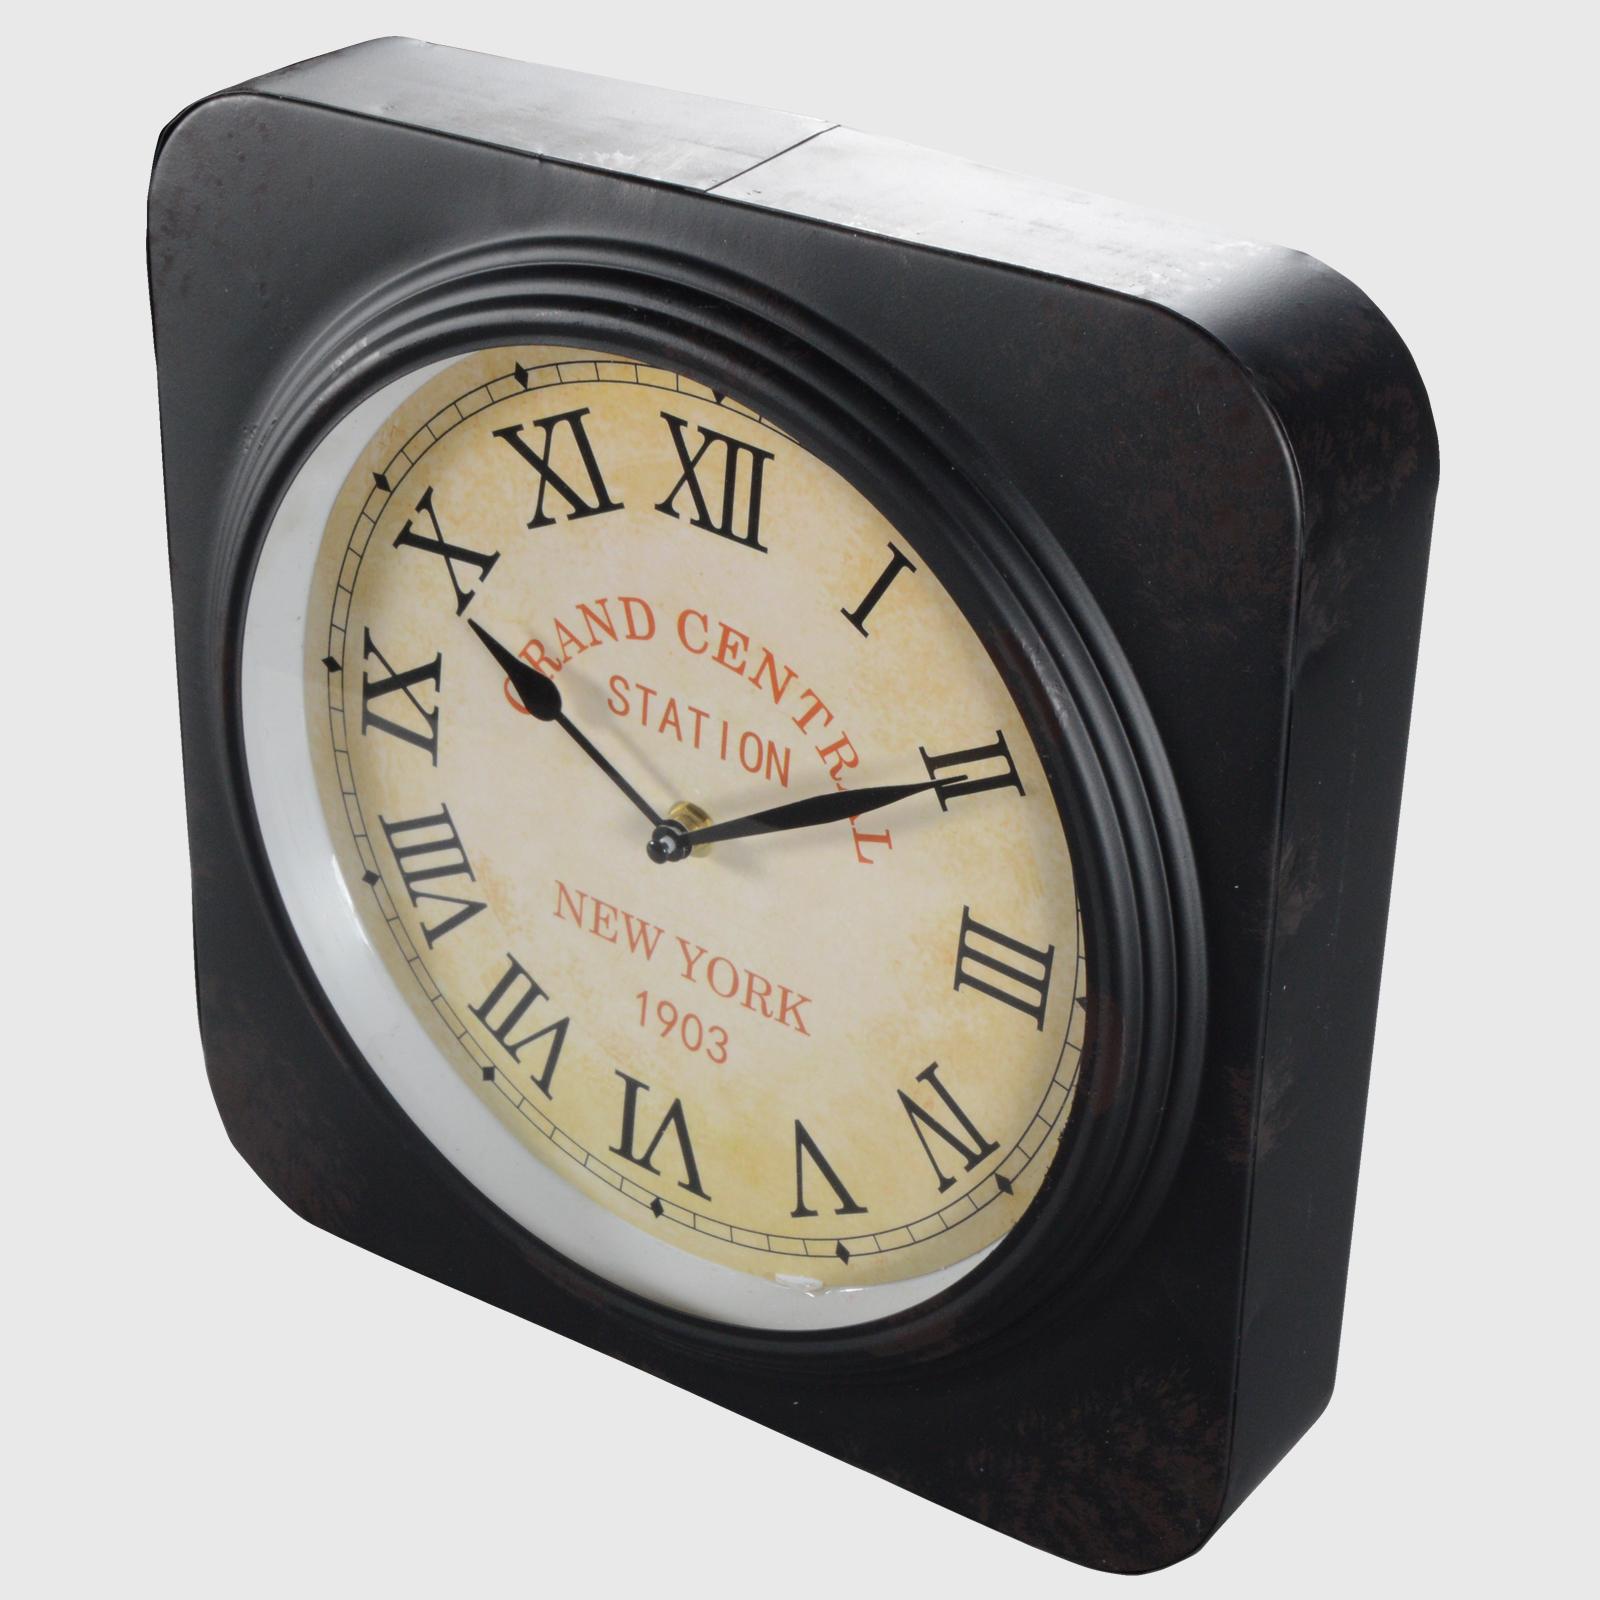 bahnhofsuhr wanduhr tischuhr kaminuhr uhr vintage metall grand central uh 001bu ebay. Black Bedroom Furniture Sets. Home Design Ideas